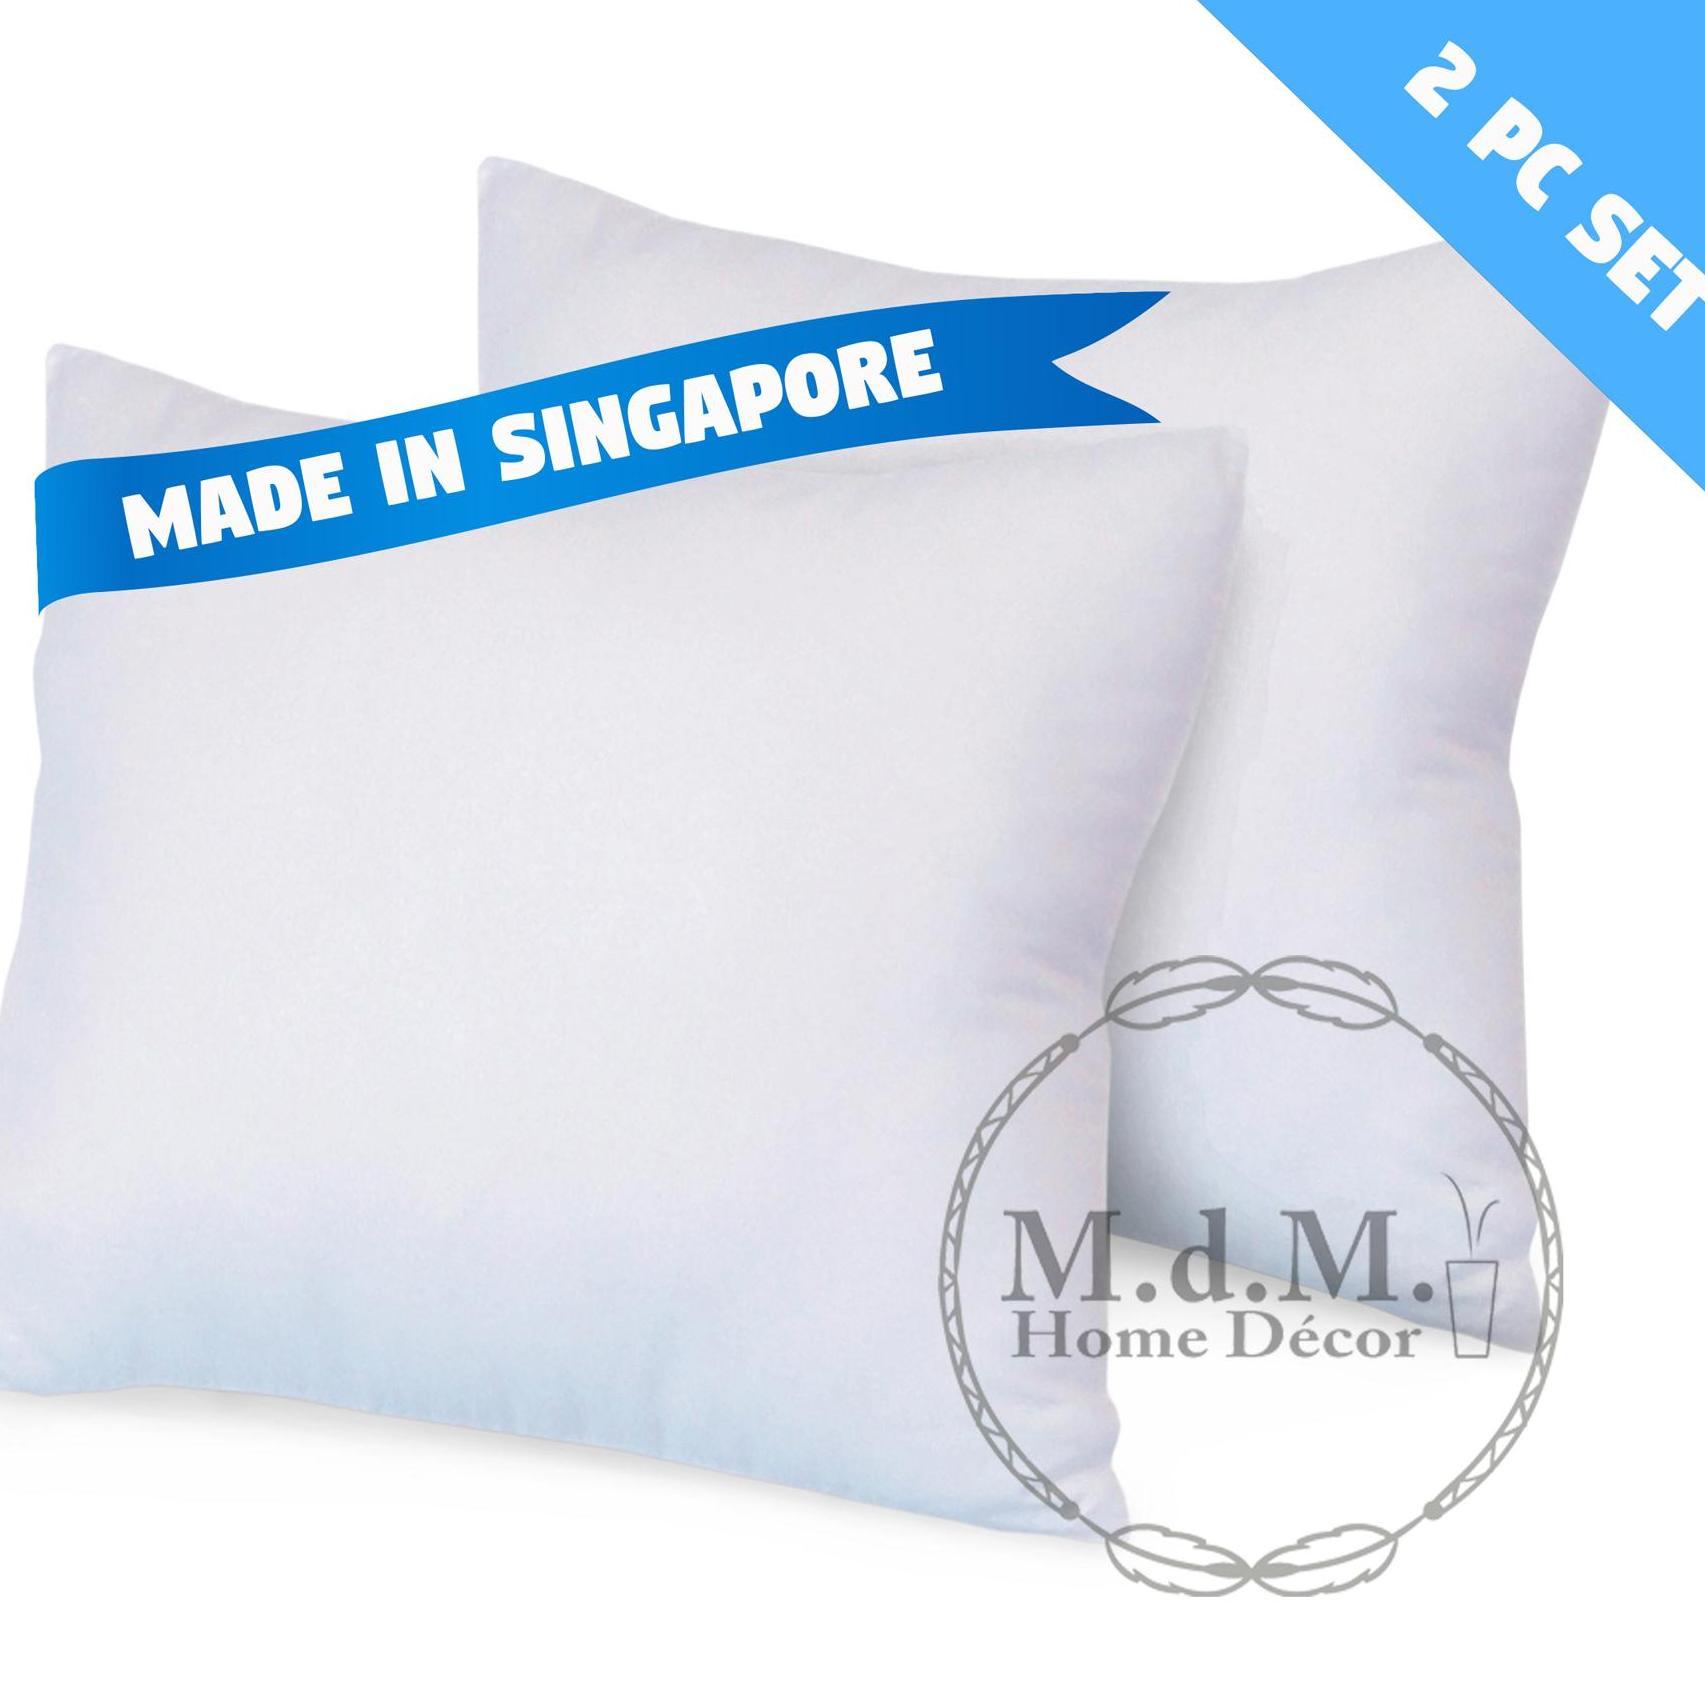 High Quality Cushion Insert 46 x 46cm